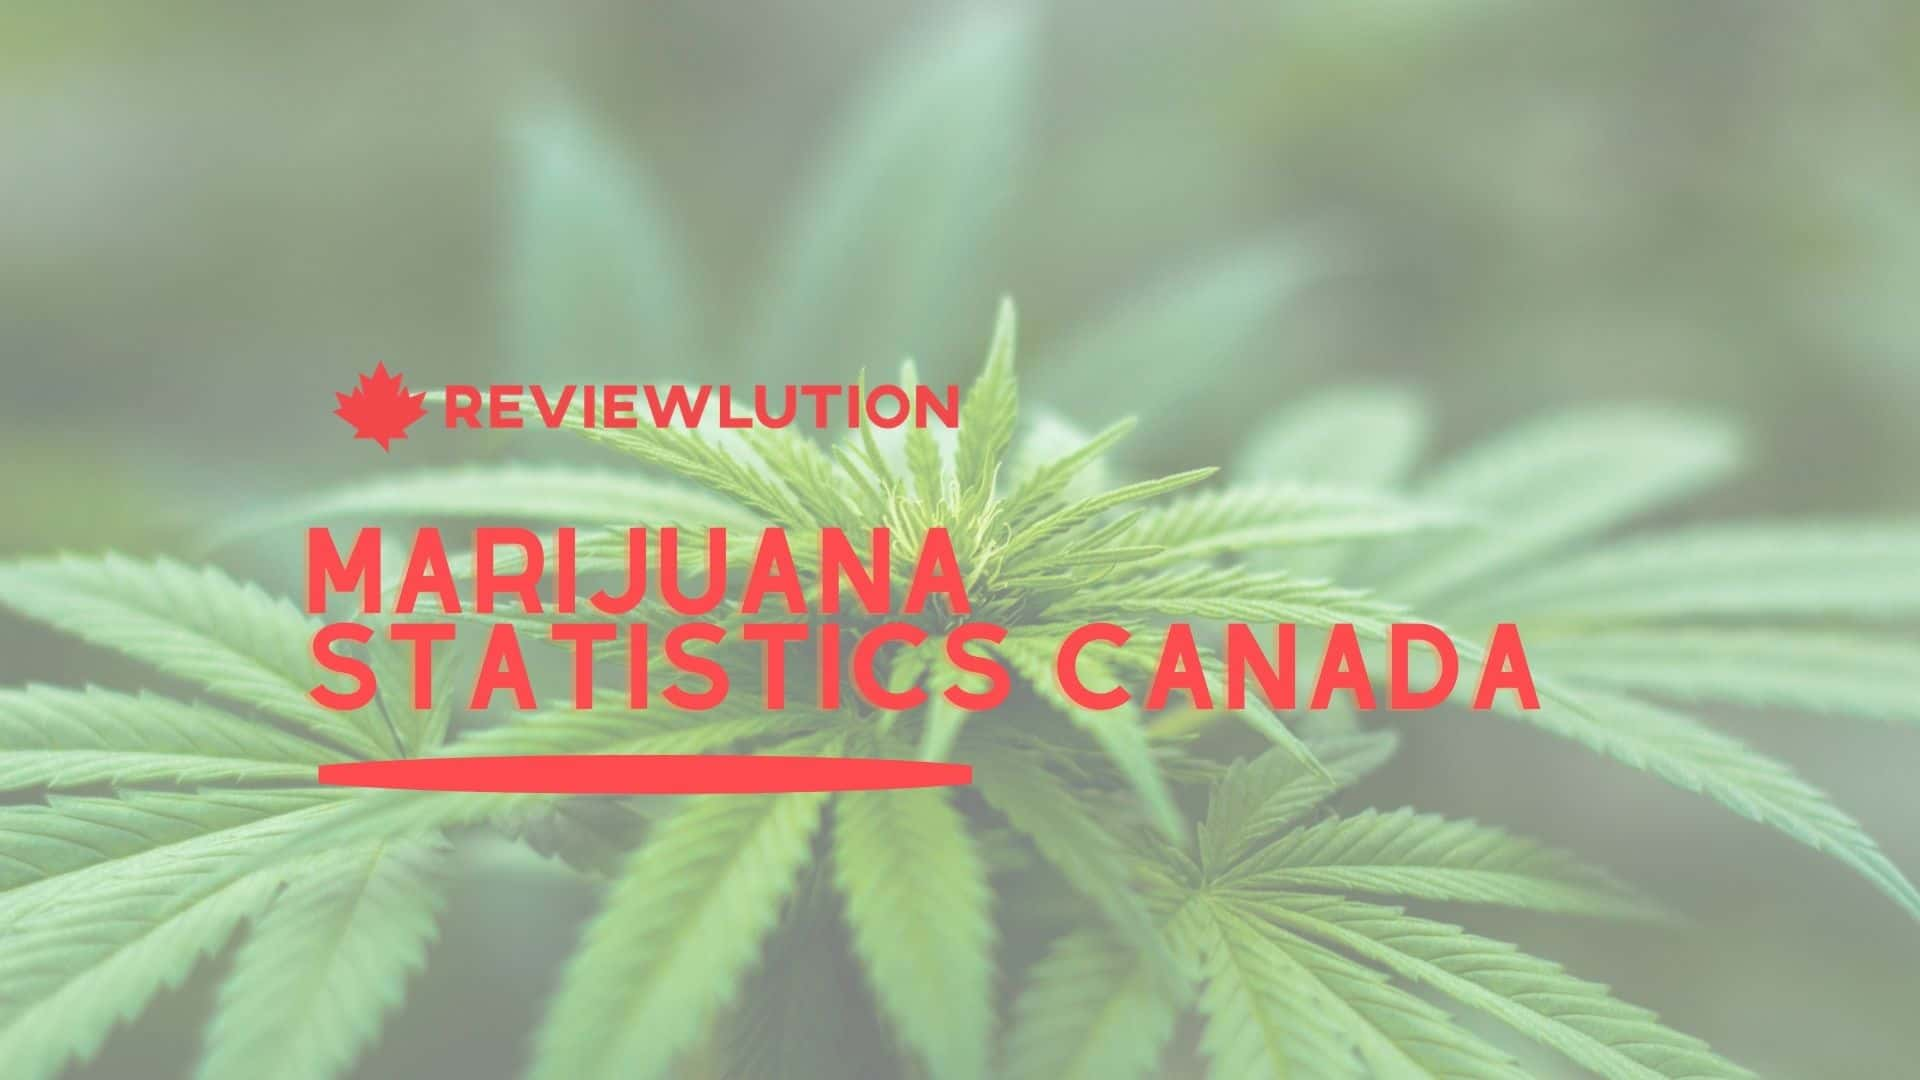 16 Eye-Opening Marijuana Statistics Canada for 2021